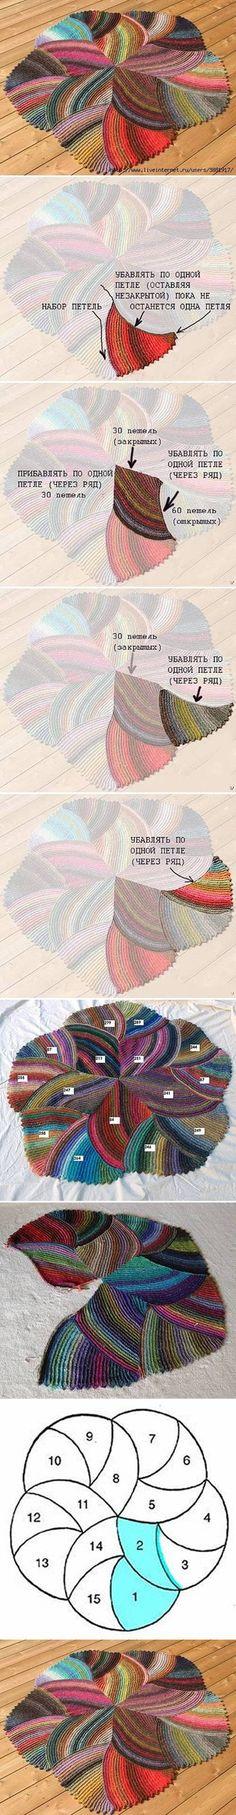 DIY Crochet Melange Flower Rug | www.FabArtDIY.com LIKE Us on Facebook ==> https://www.facebook.com/FabArtDIY